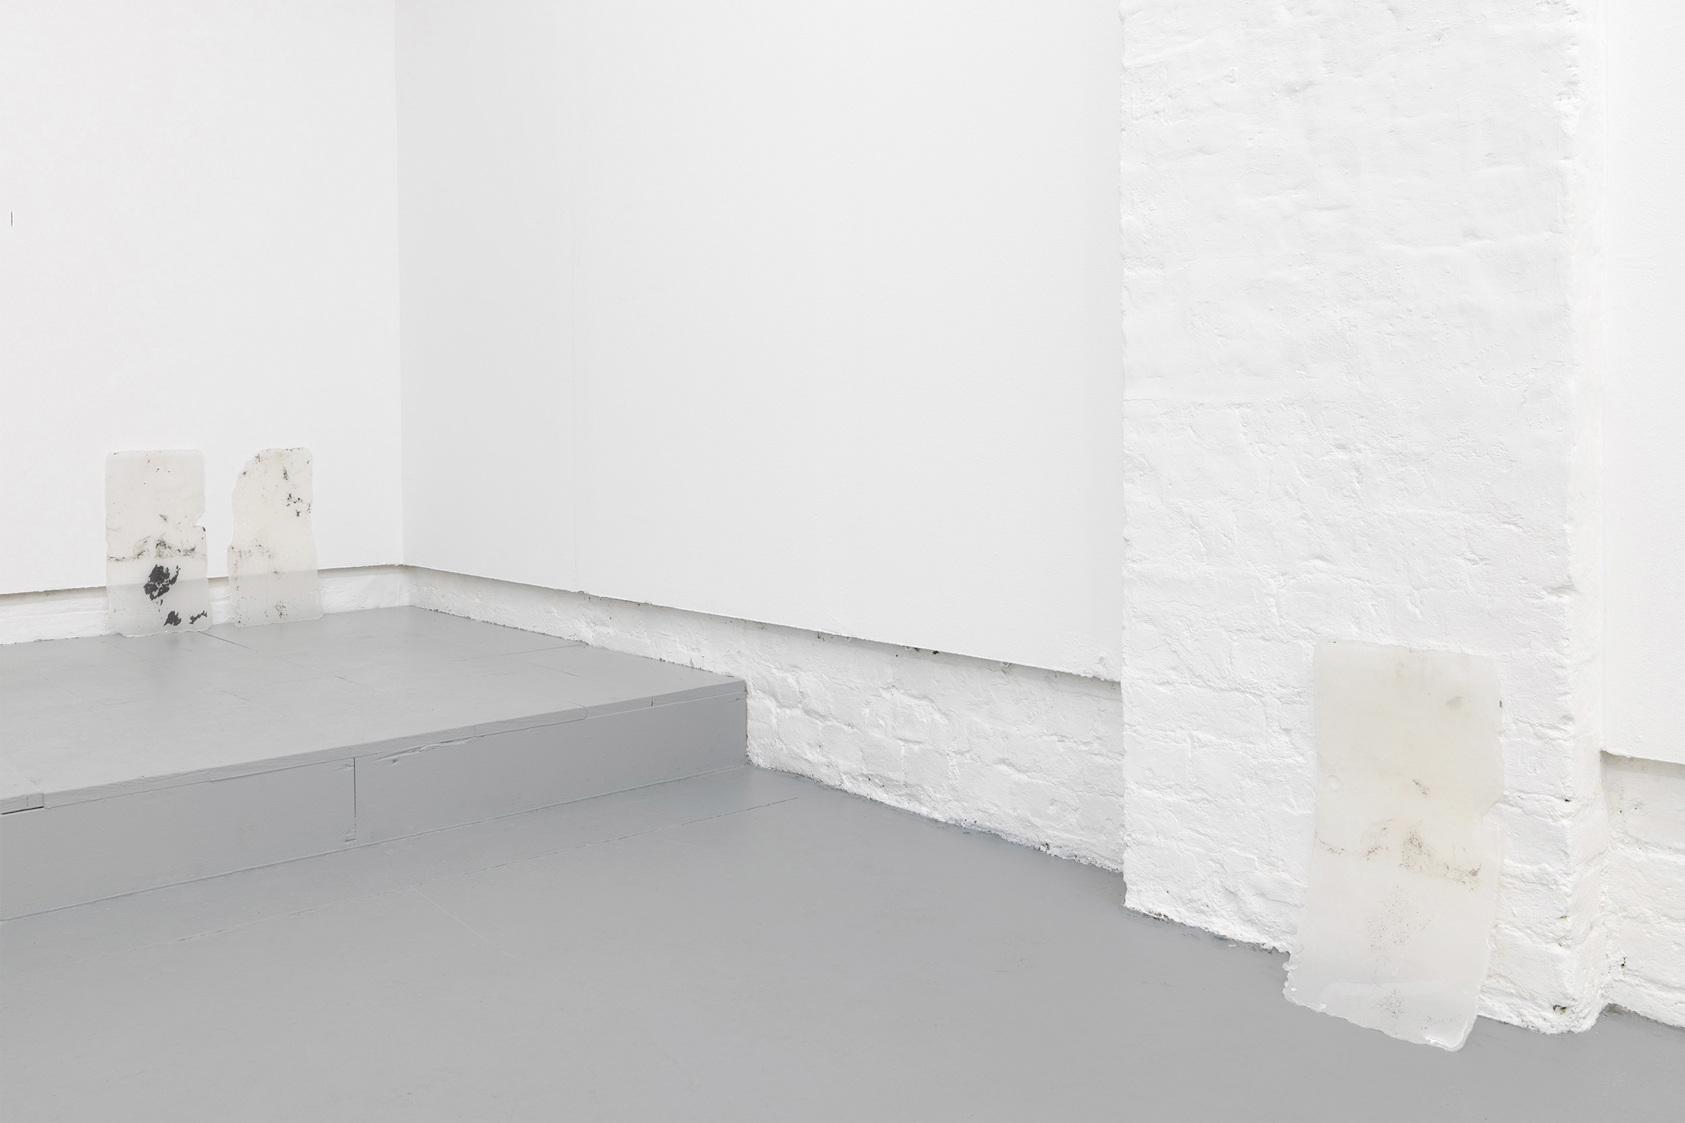 Andrea Zucchini, Untitled, 2014. Glass wax, slate.